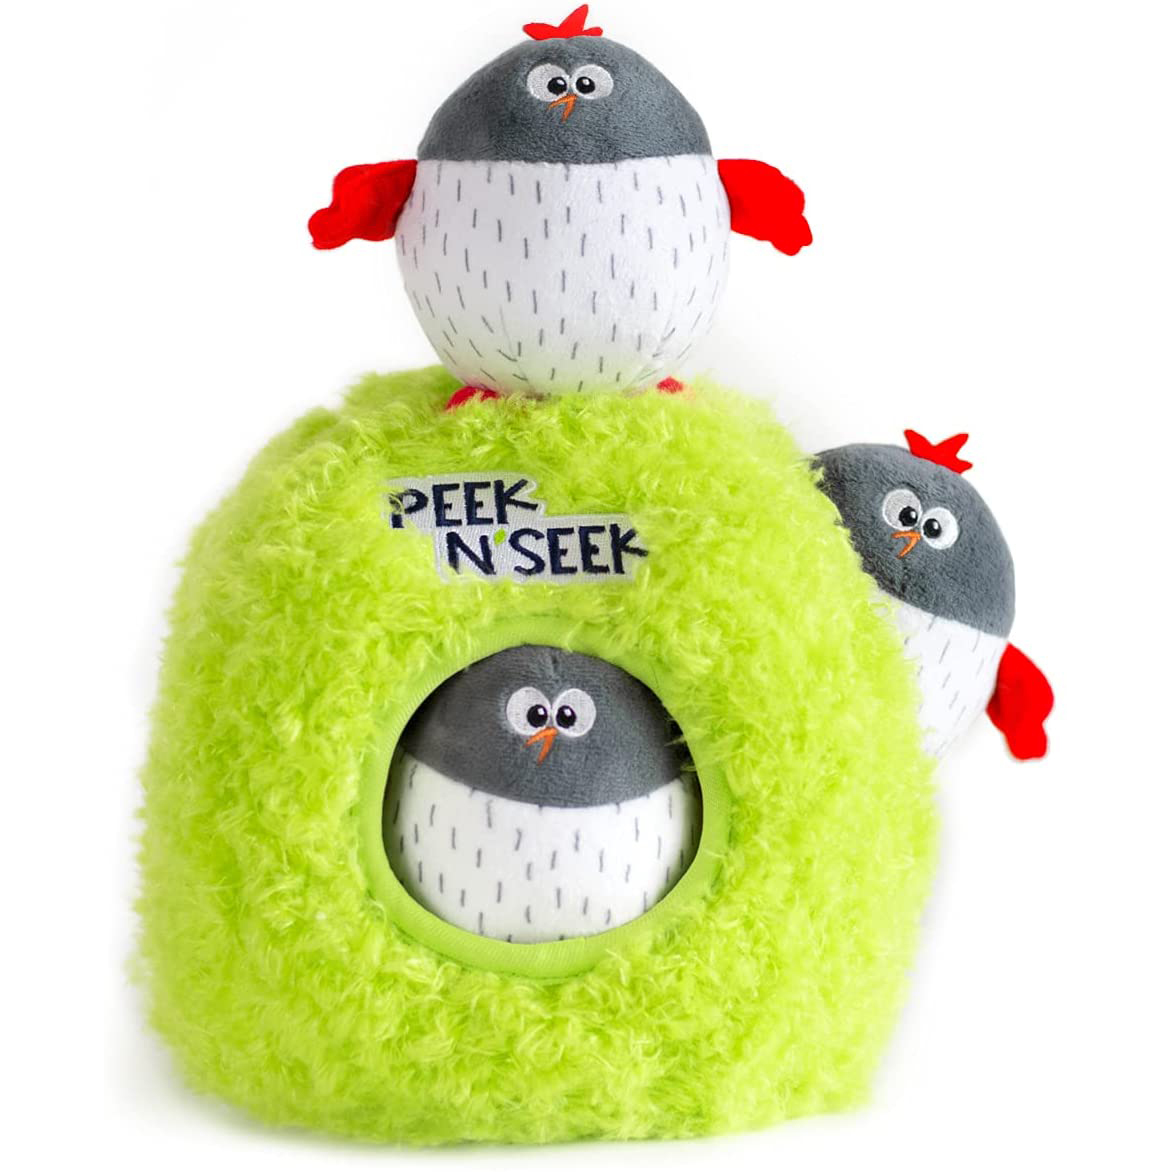 Tough Plush Toys for Dogs feat. BULLTUG Peek N' Seek Puzzle Toy via Amazon